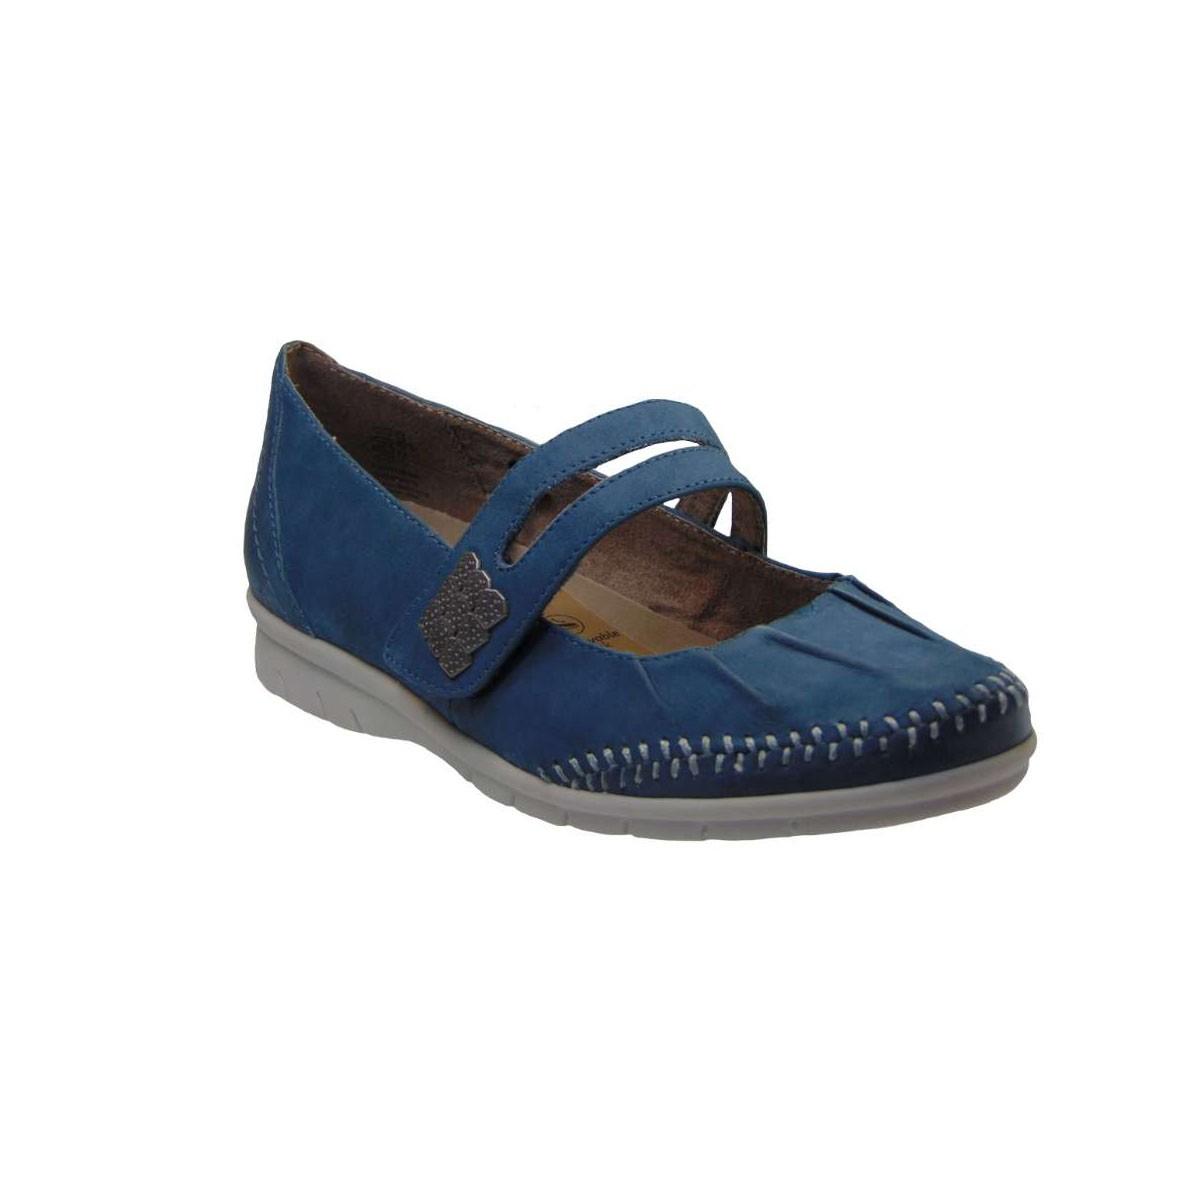 Jana 24611-846 Casual Γυναικείο Απο Γνήσιο Δέρμα Μπλε (Jeans)